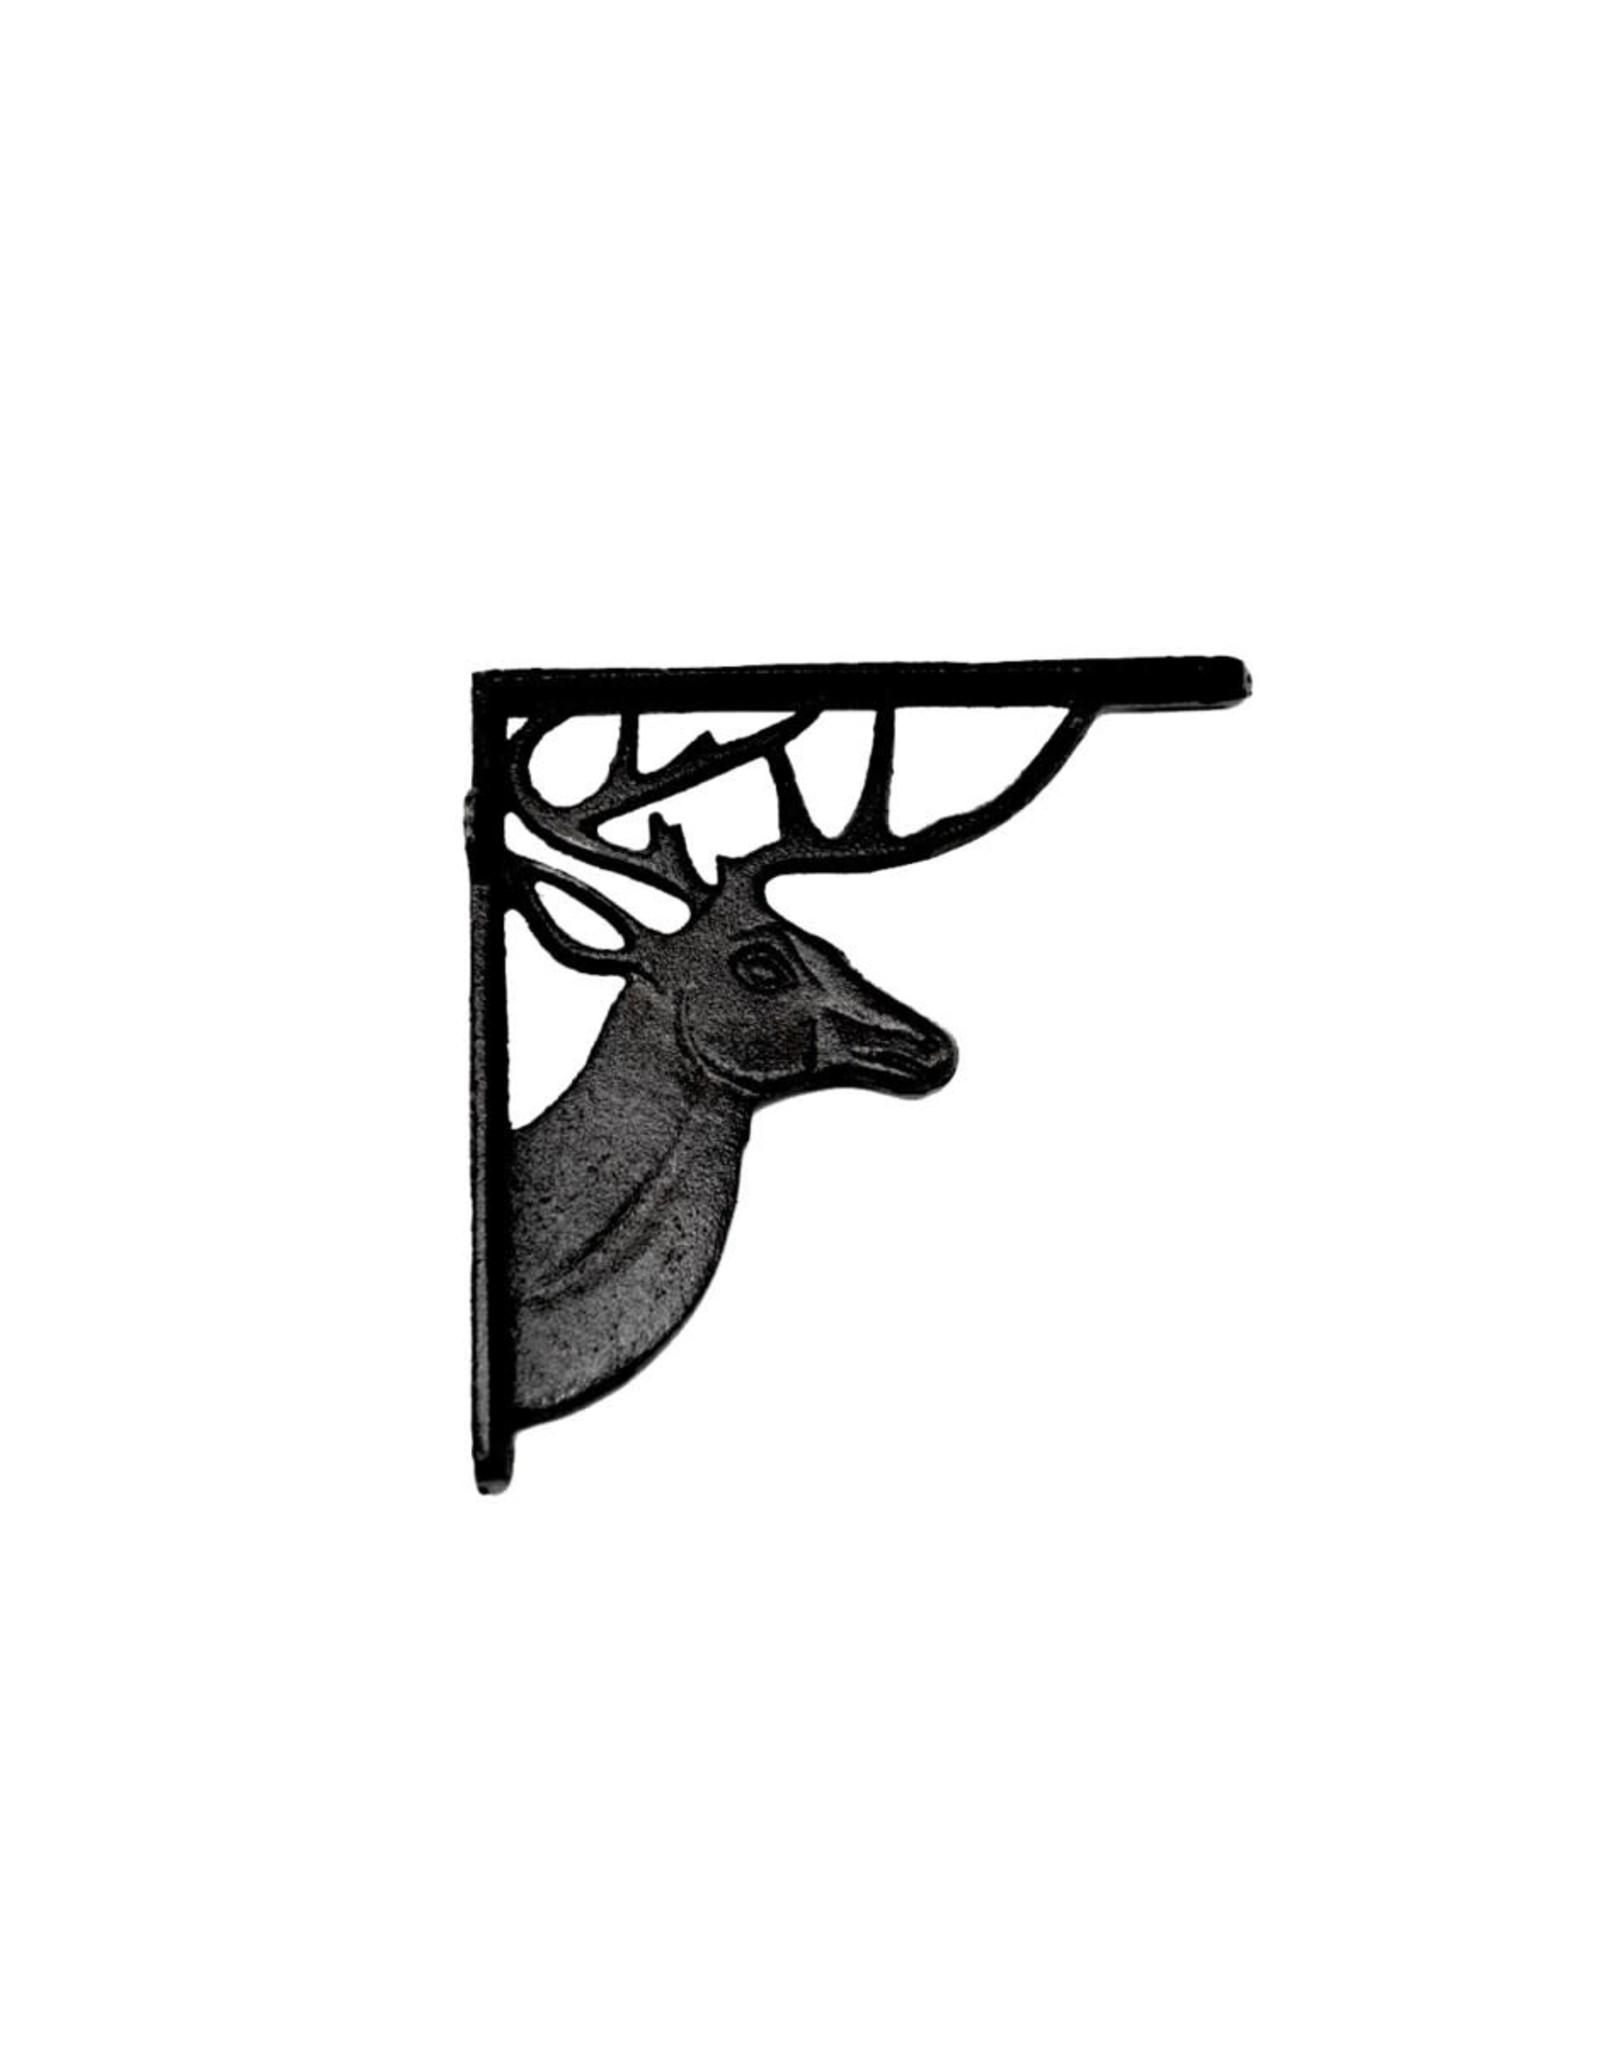 Support à tablette - cerf noir